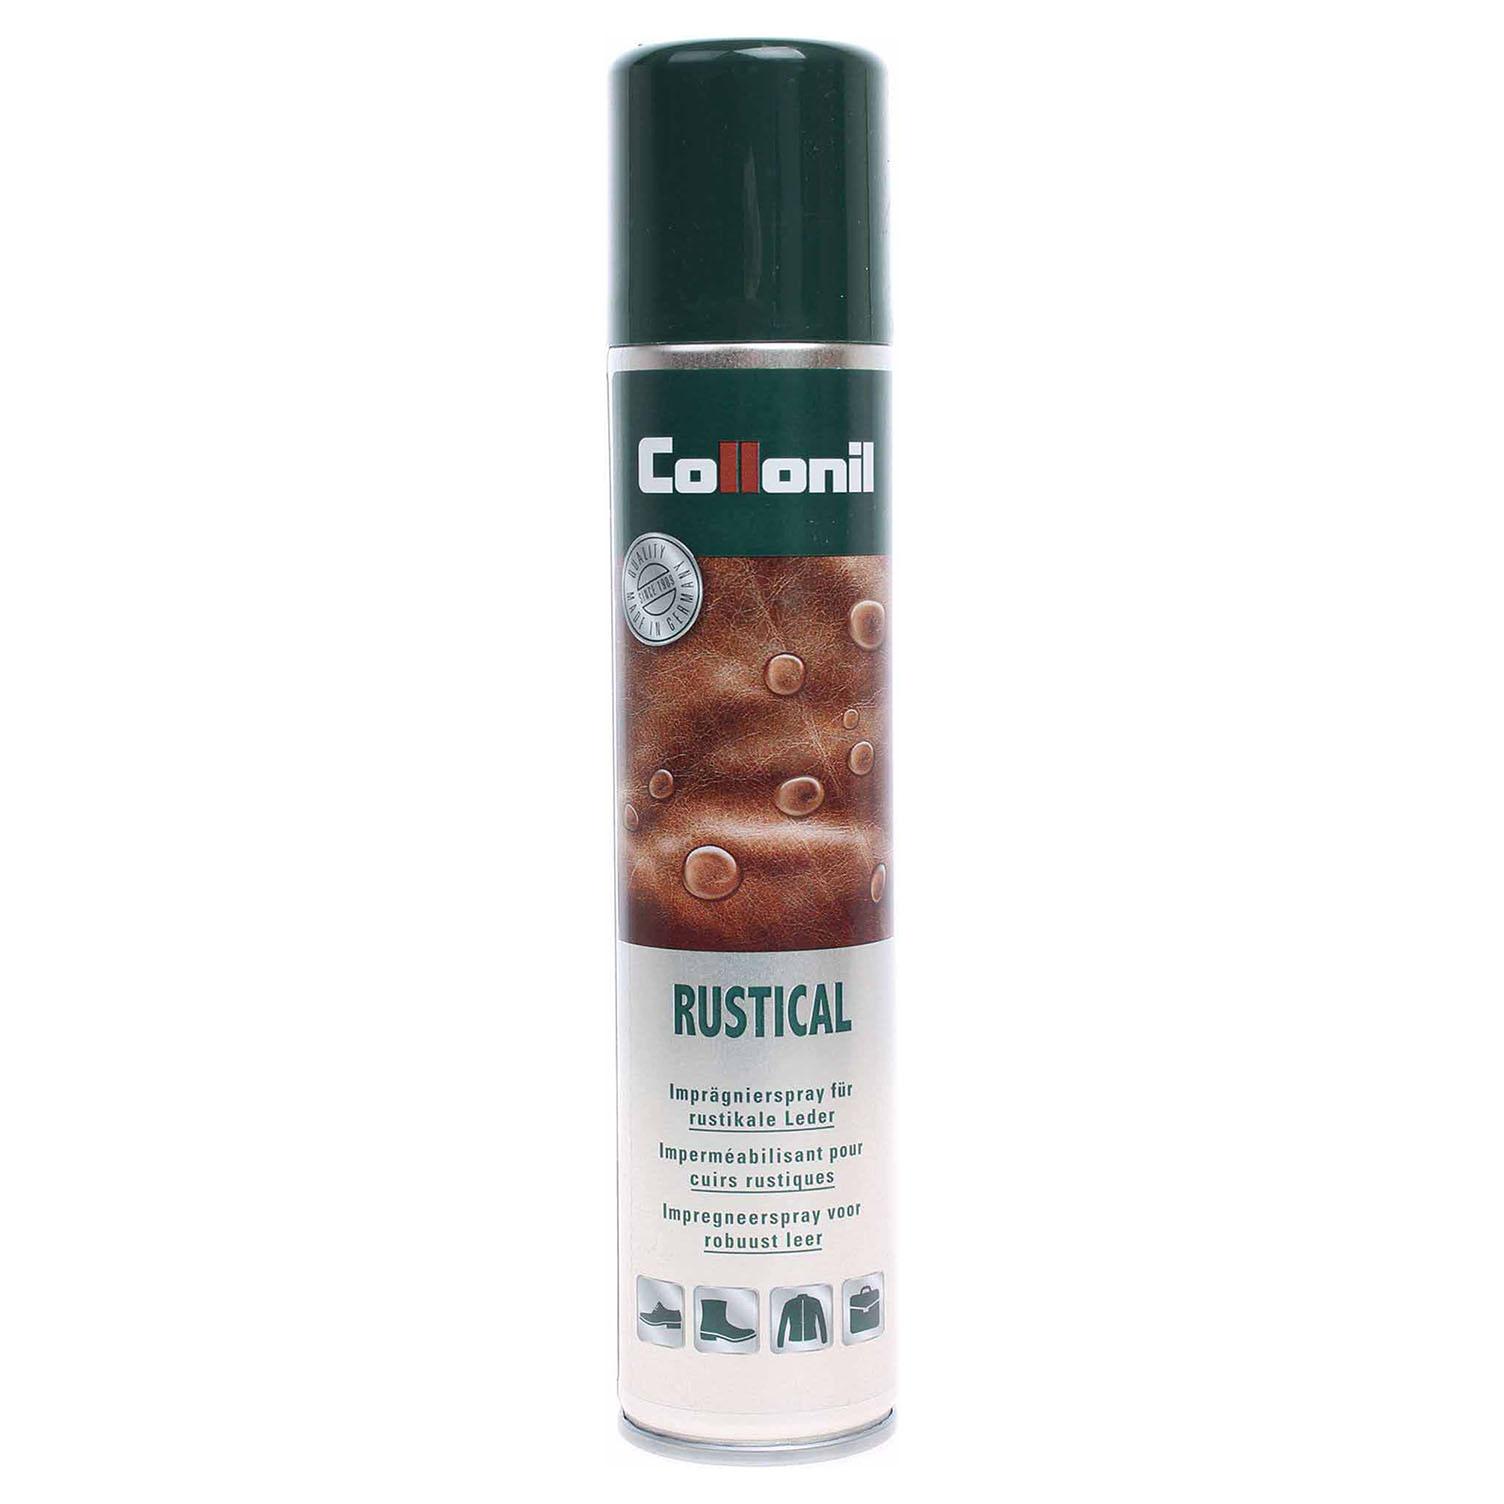 Collonil Rustikal spray